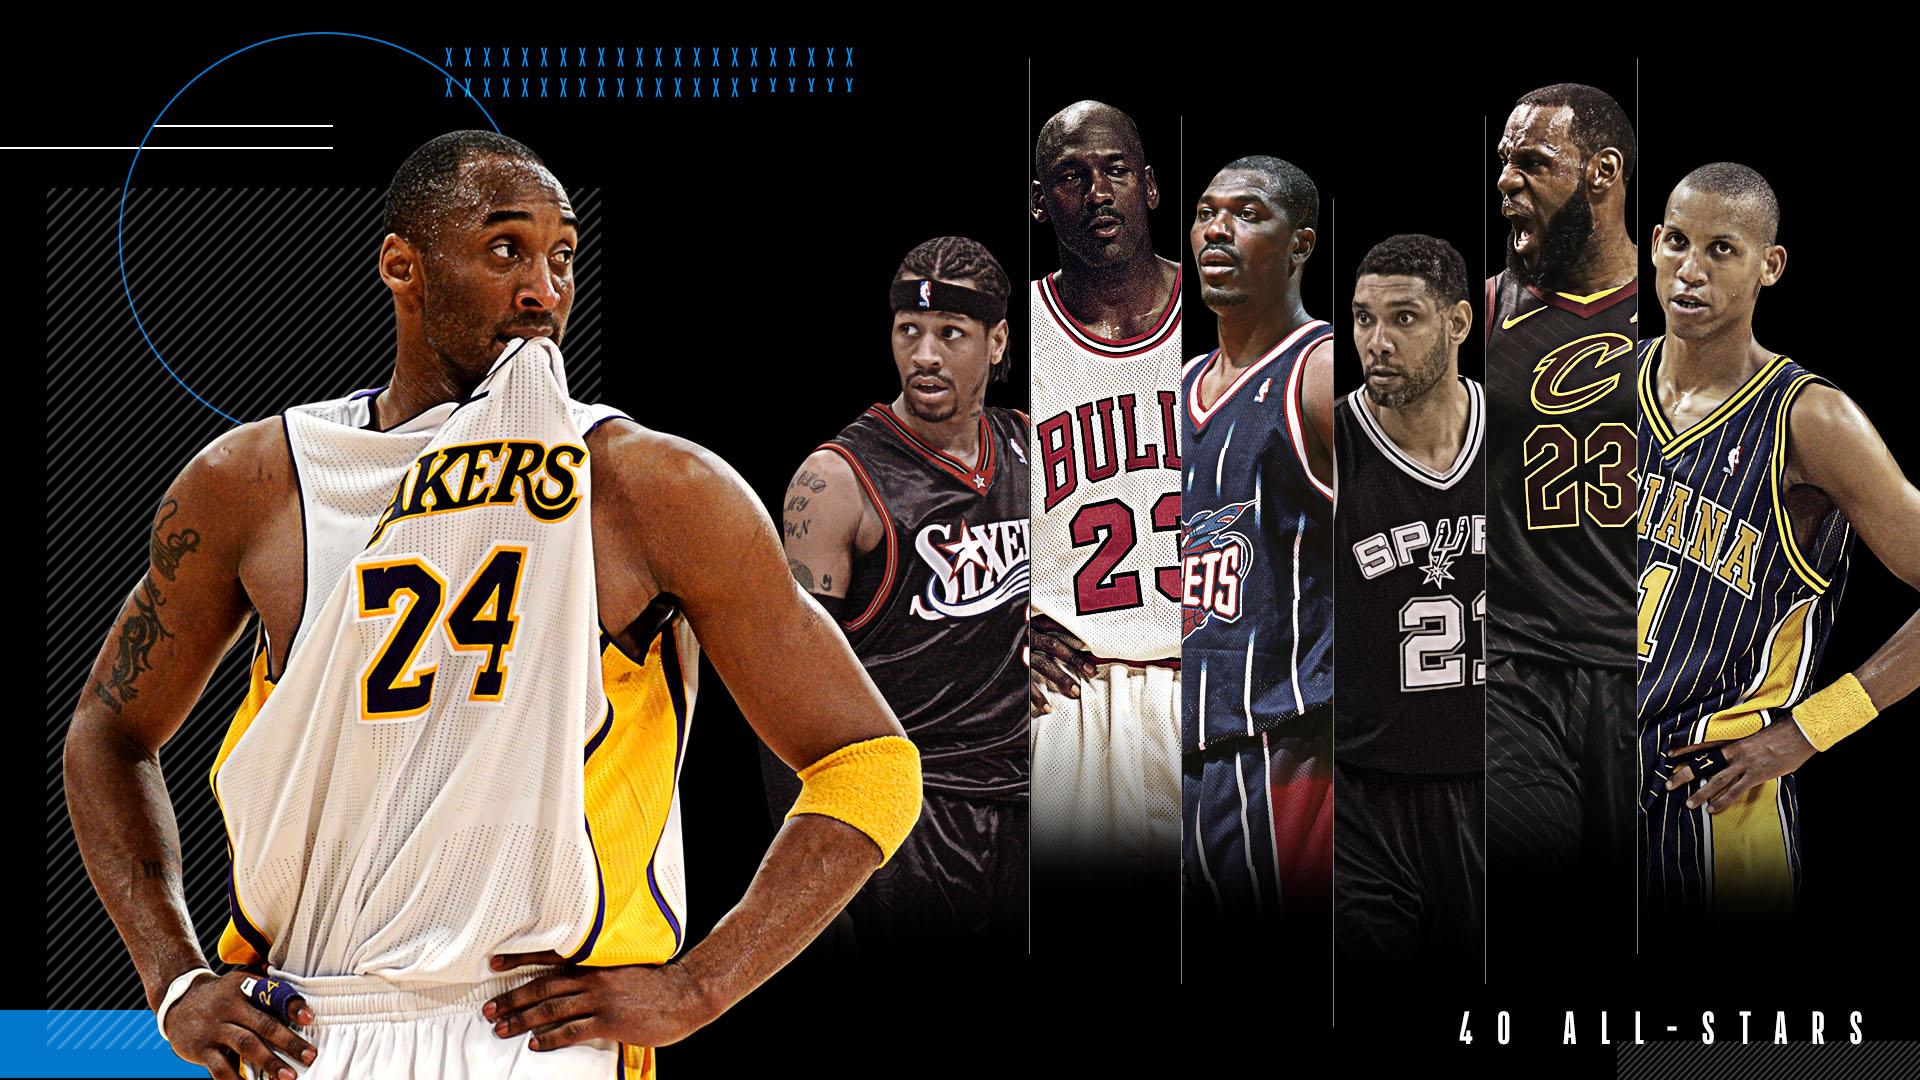 20a622b73190 Details behind Kobe Bryant s biggest individual rivalries